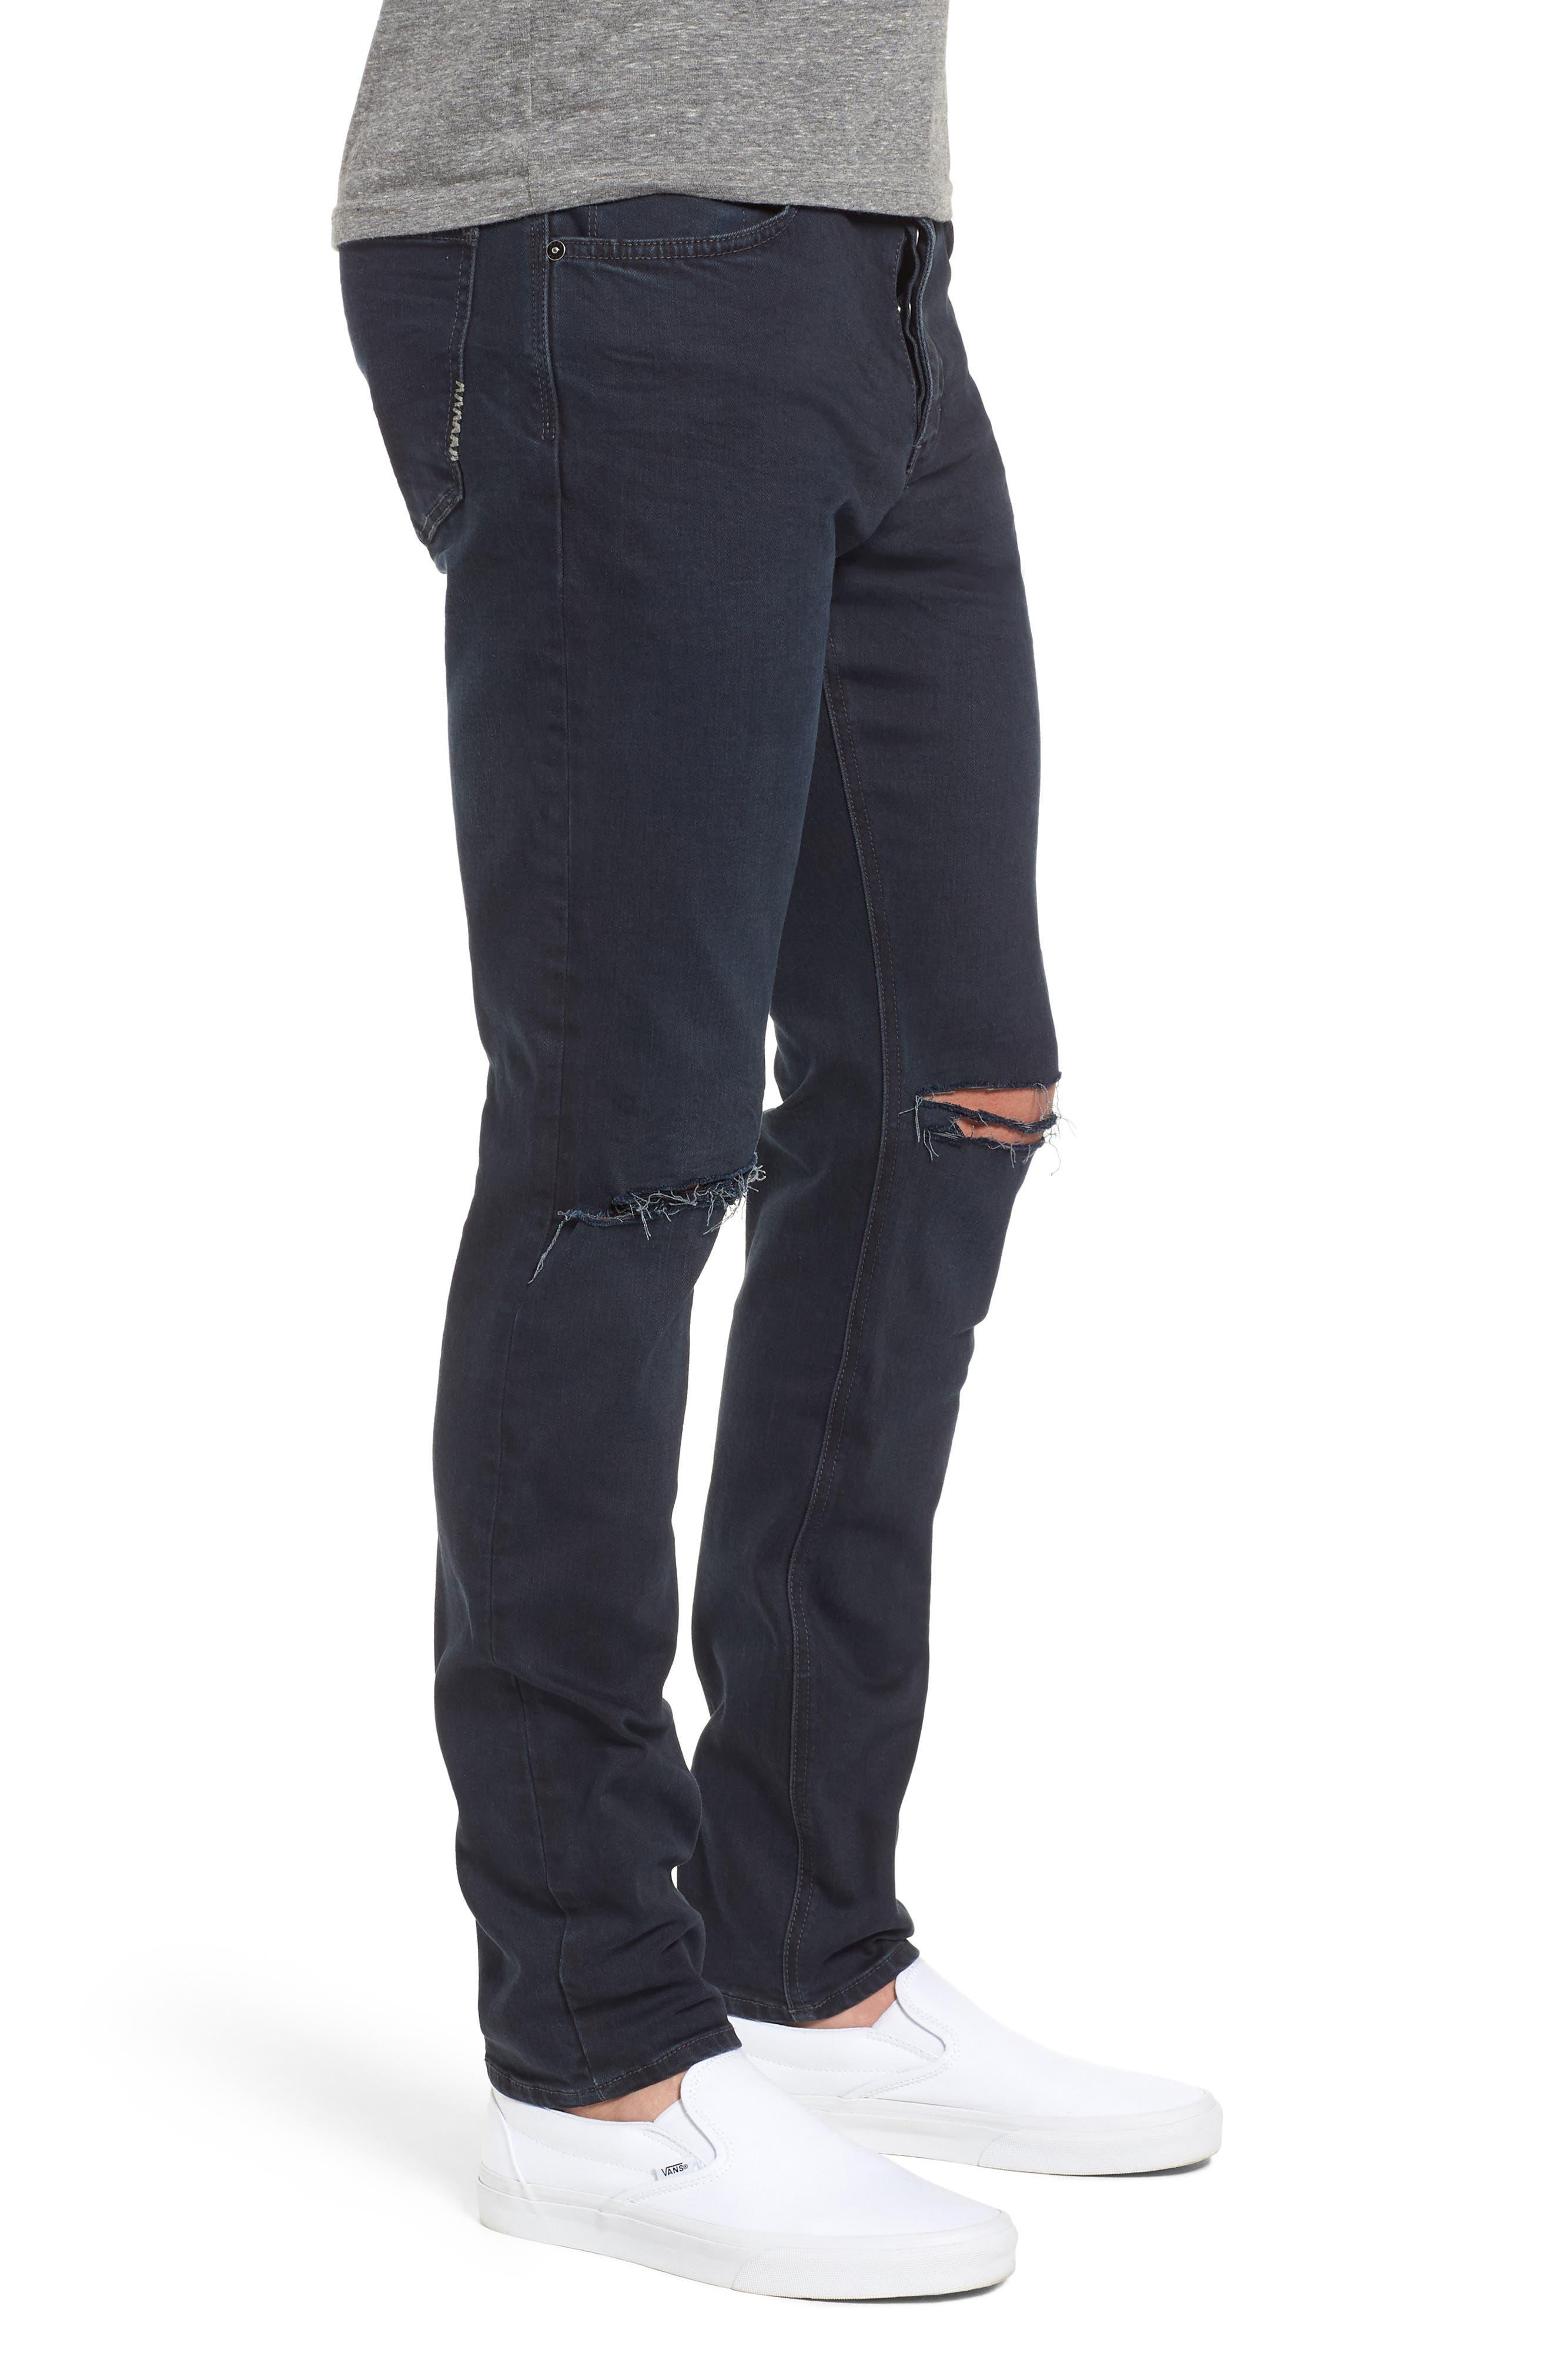 Iggy Skinny Fit Jeans,                             Alternate thumbnail 3, color,                             Blue Lines Broken